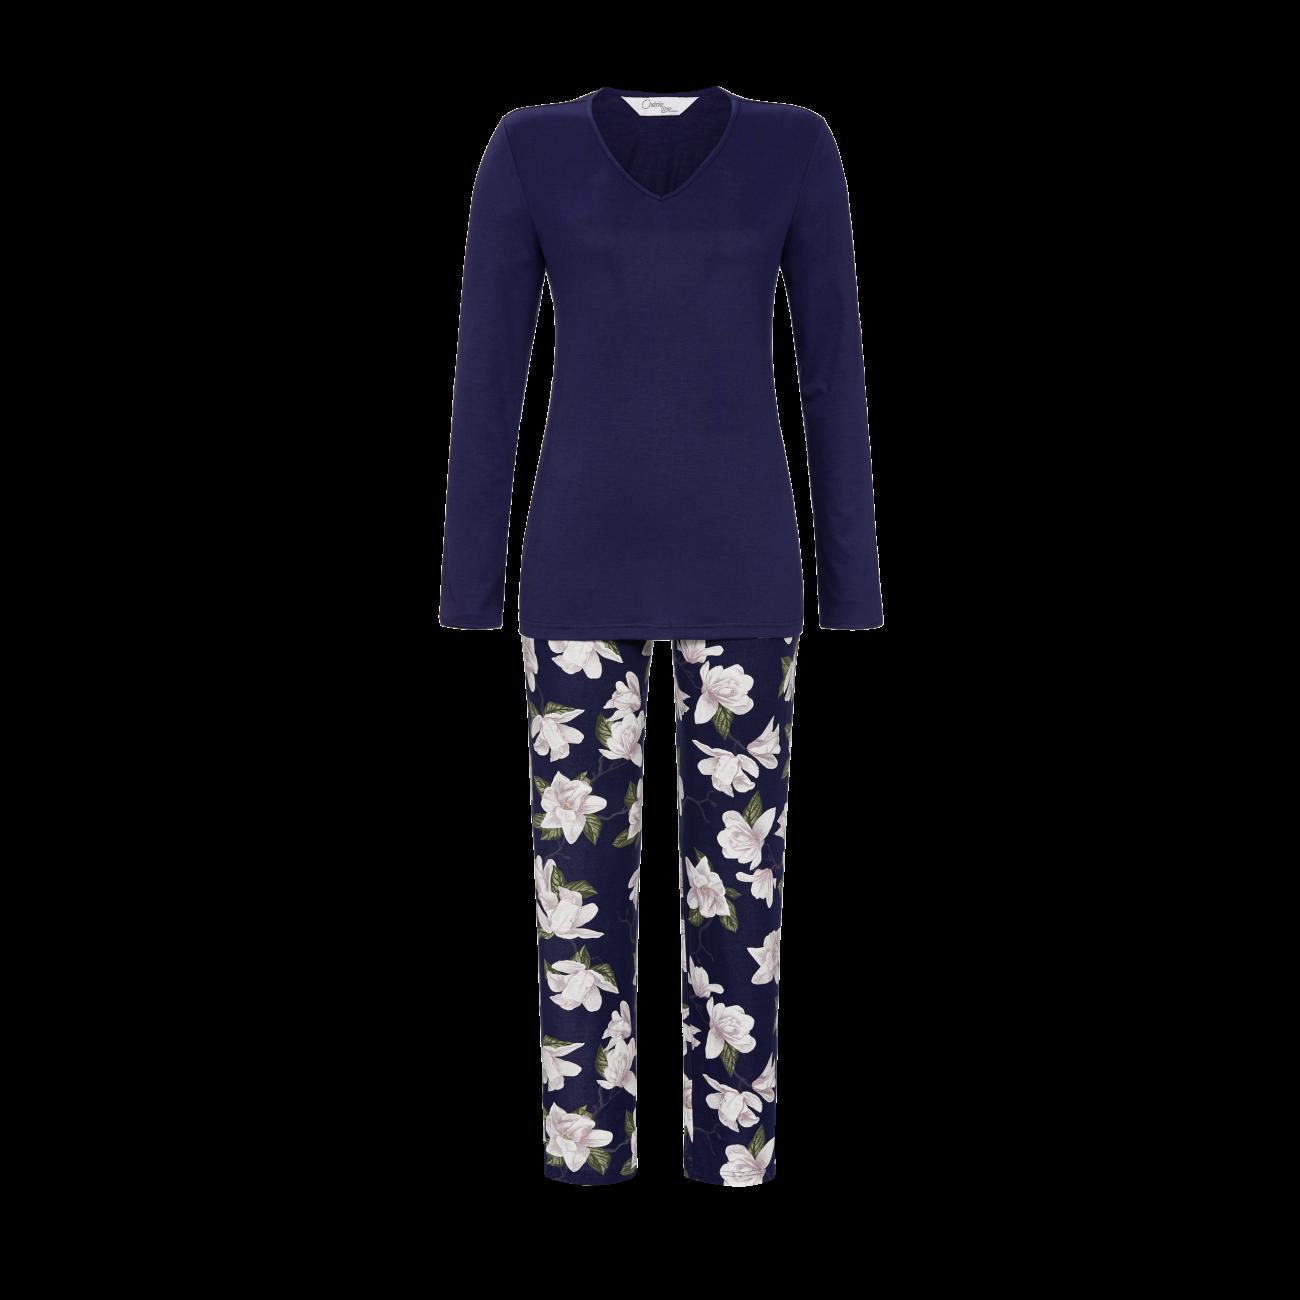 Pyjama mit V-Ausschnitt night | 36